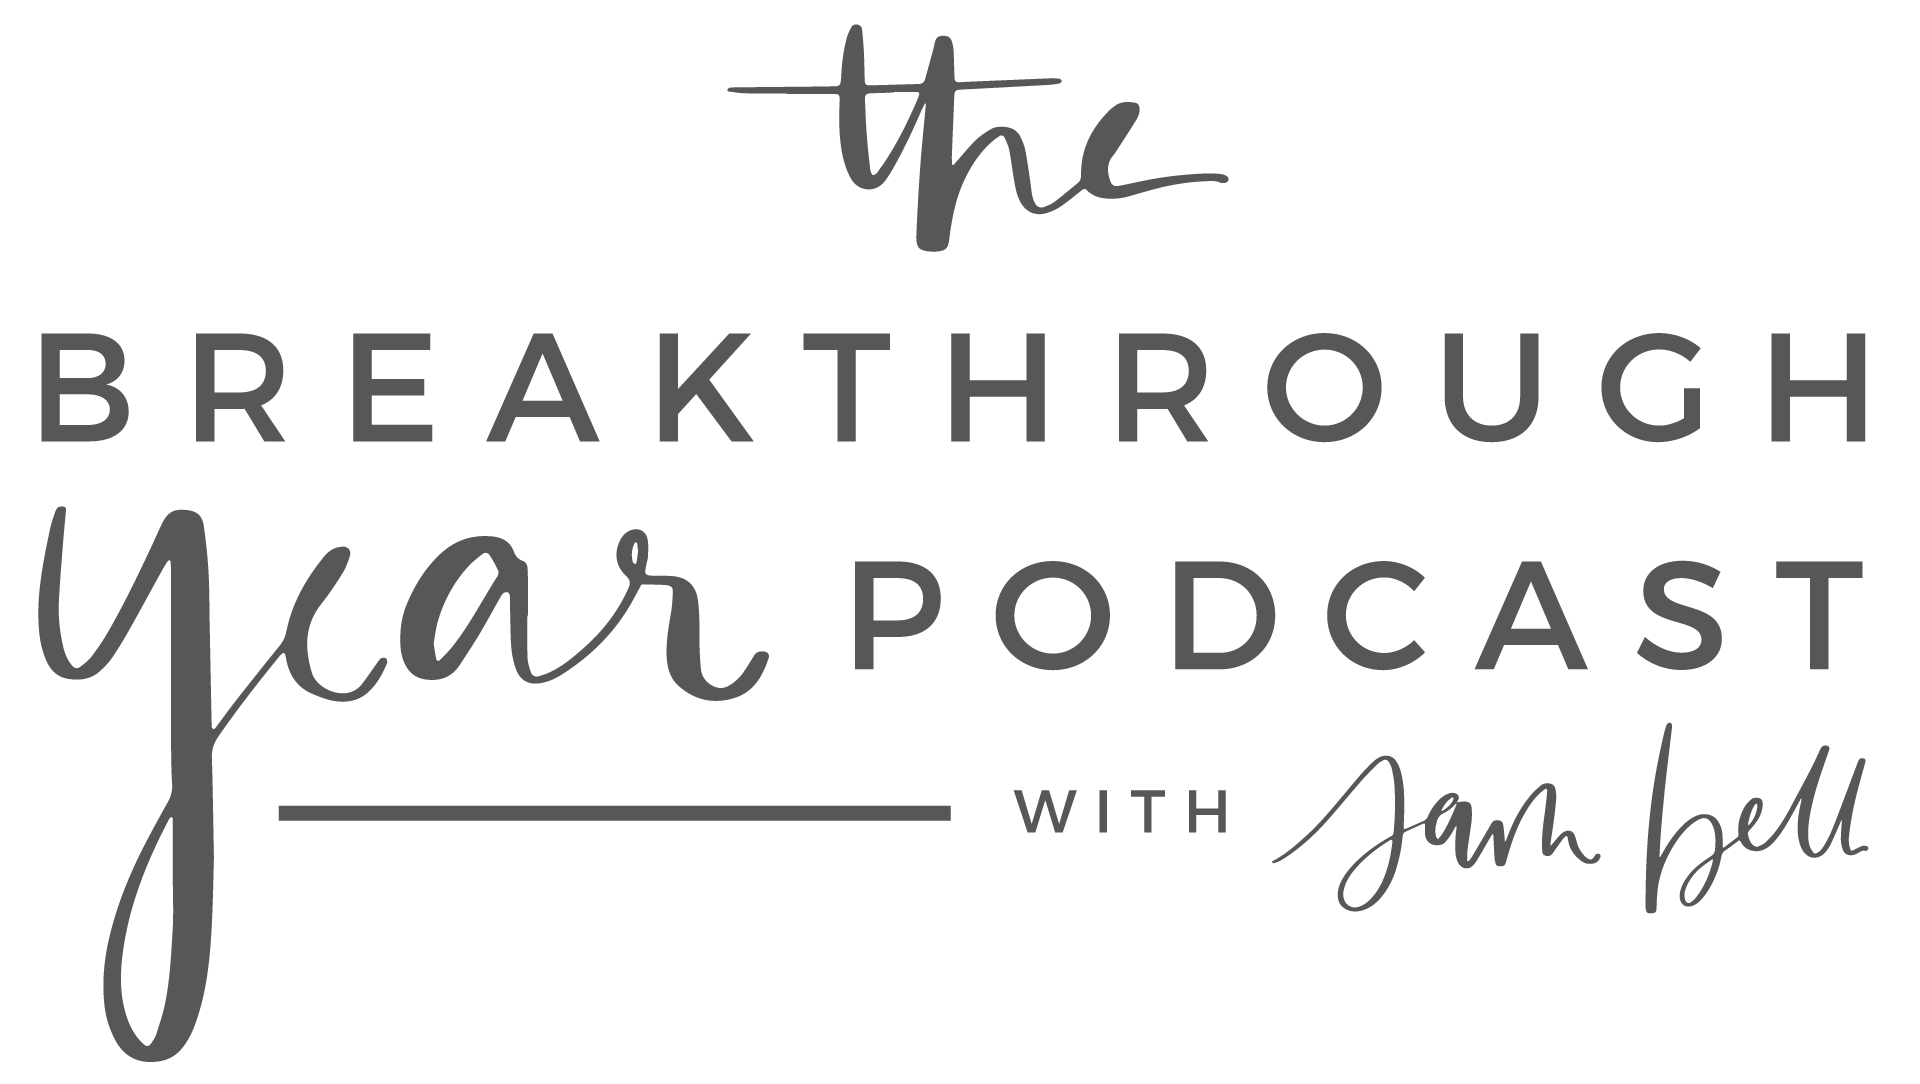 TheBreakthroughYearPodcast_GreyLogo.png